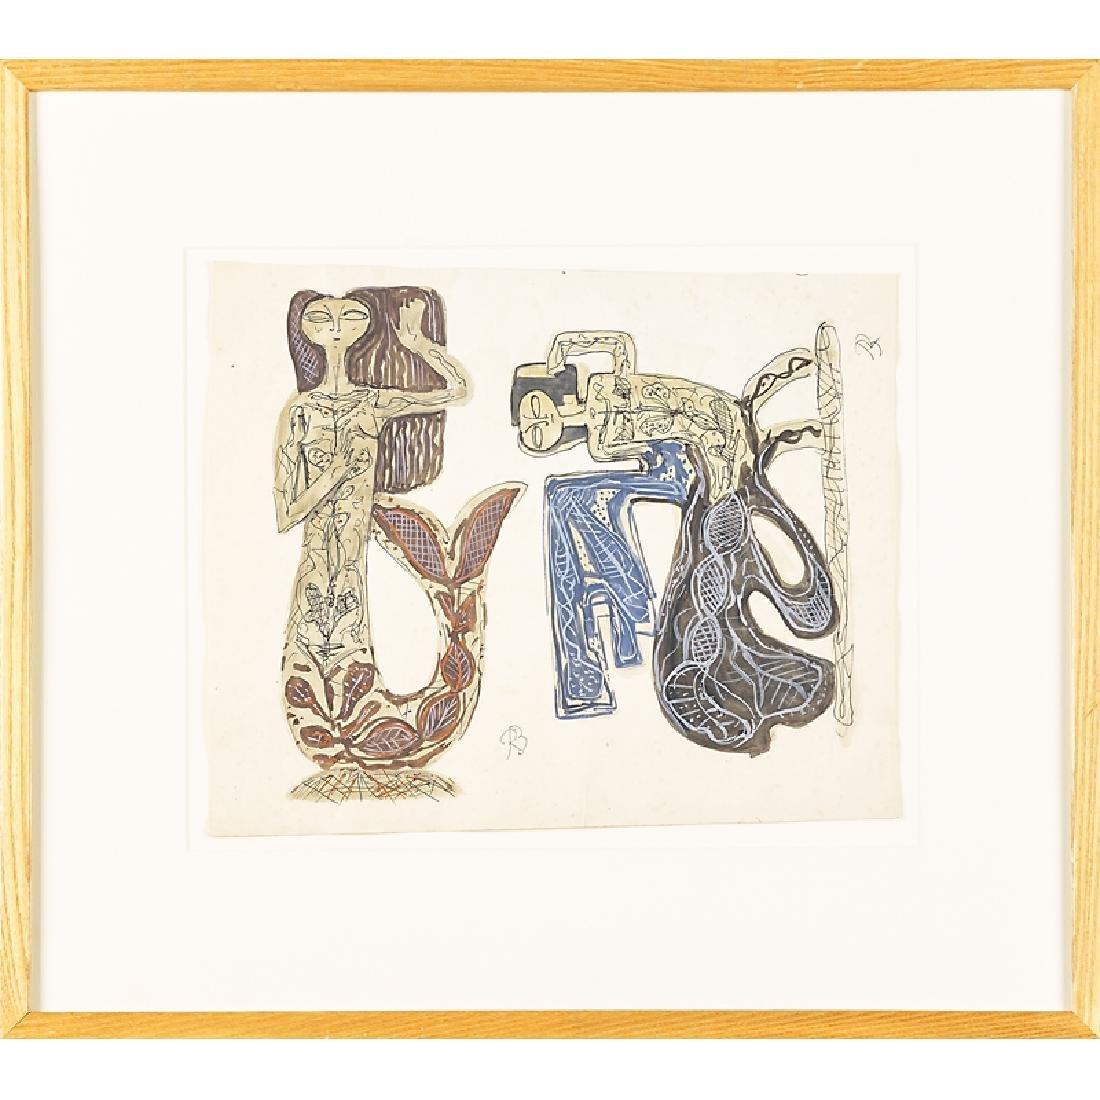 RENE BUTHAUD Two sculpture studies